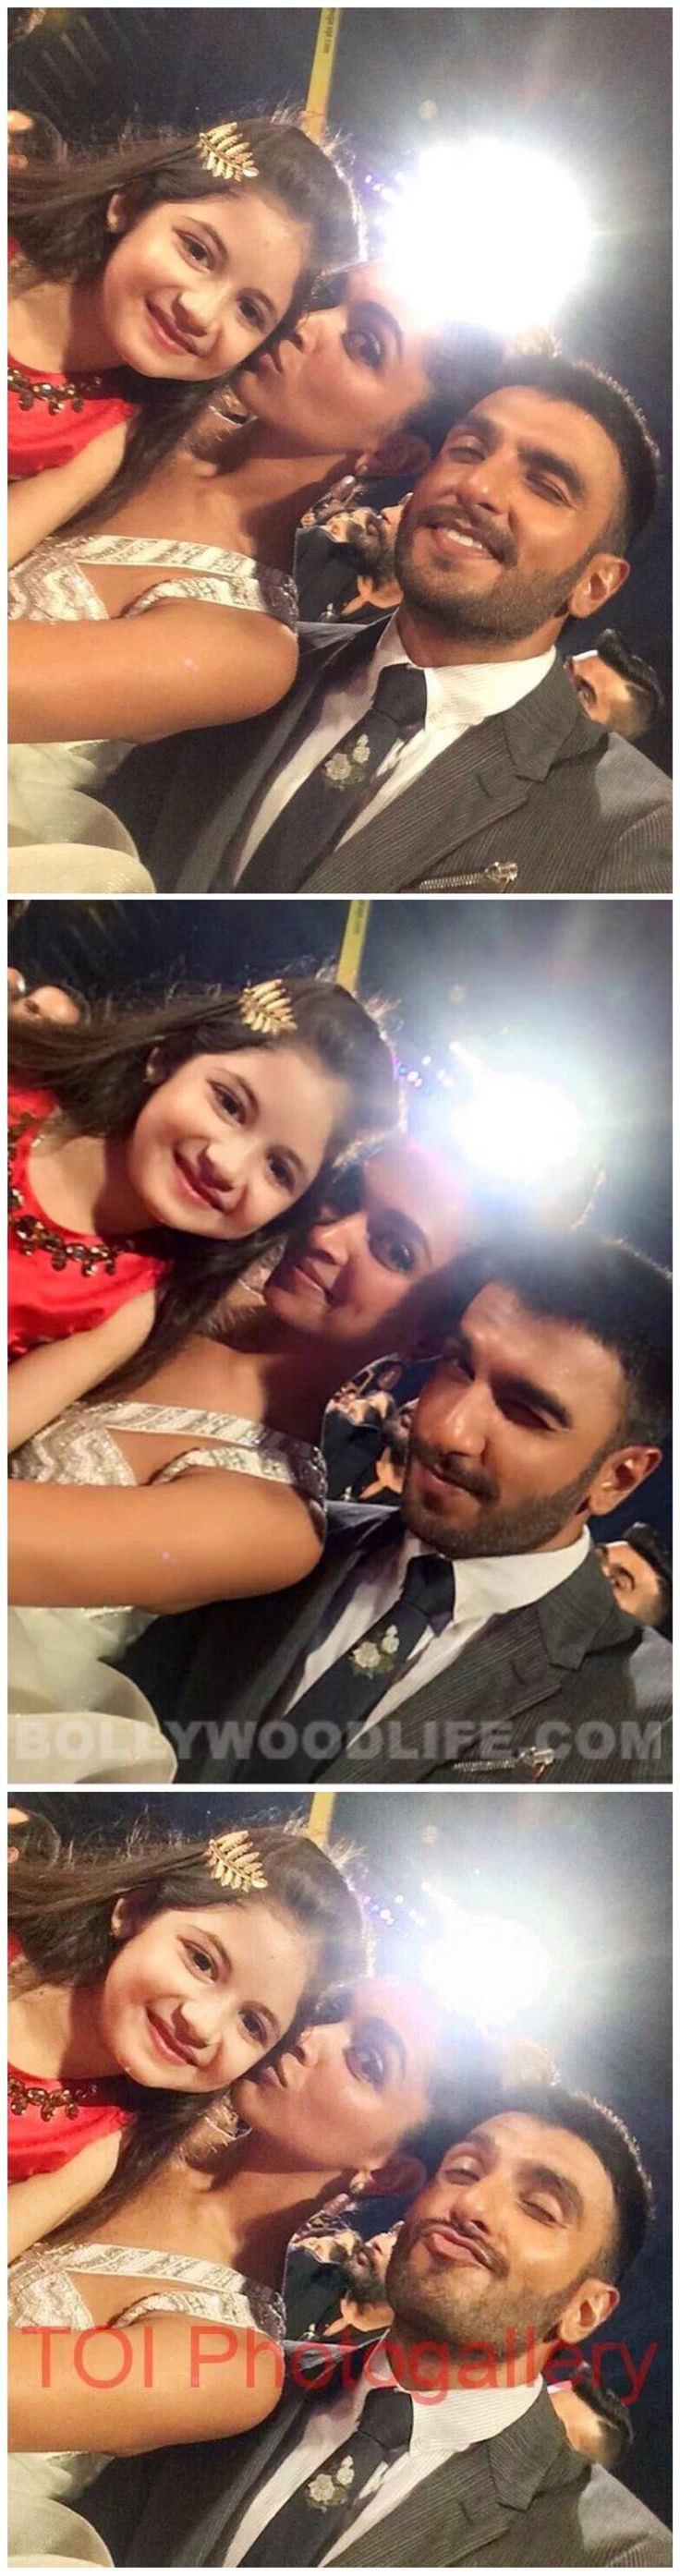 OmgDeepika and Ranveer with the little girl from Bajrangi Bhaijaan! So cute!!!!❤️❤️❤️